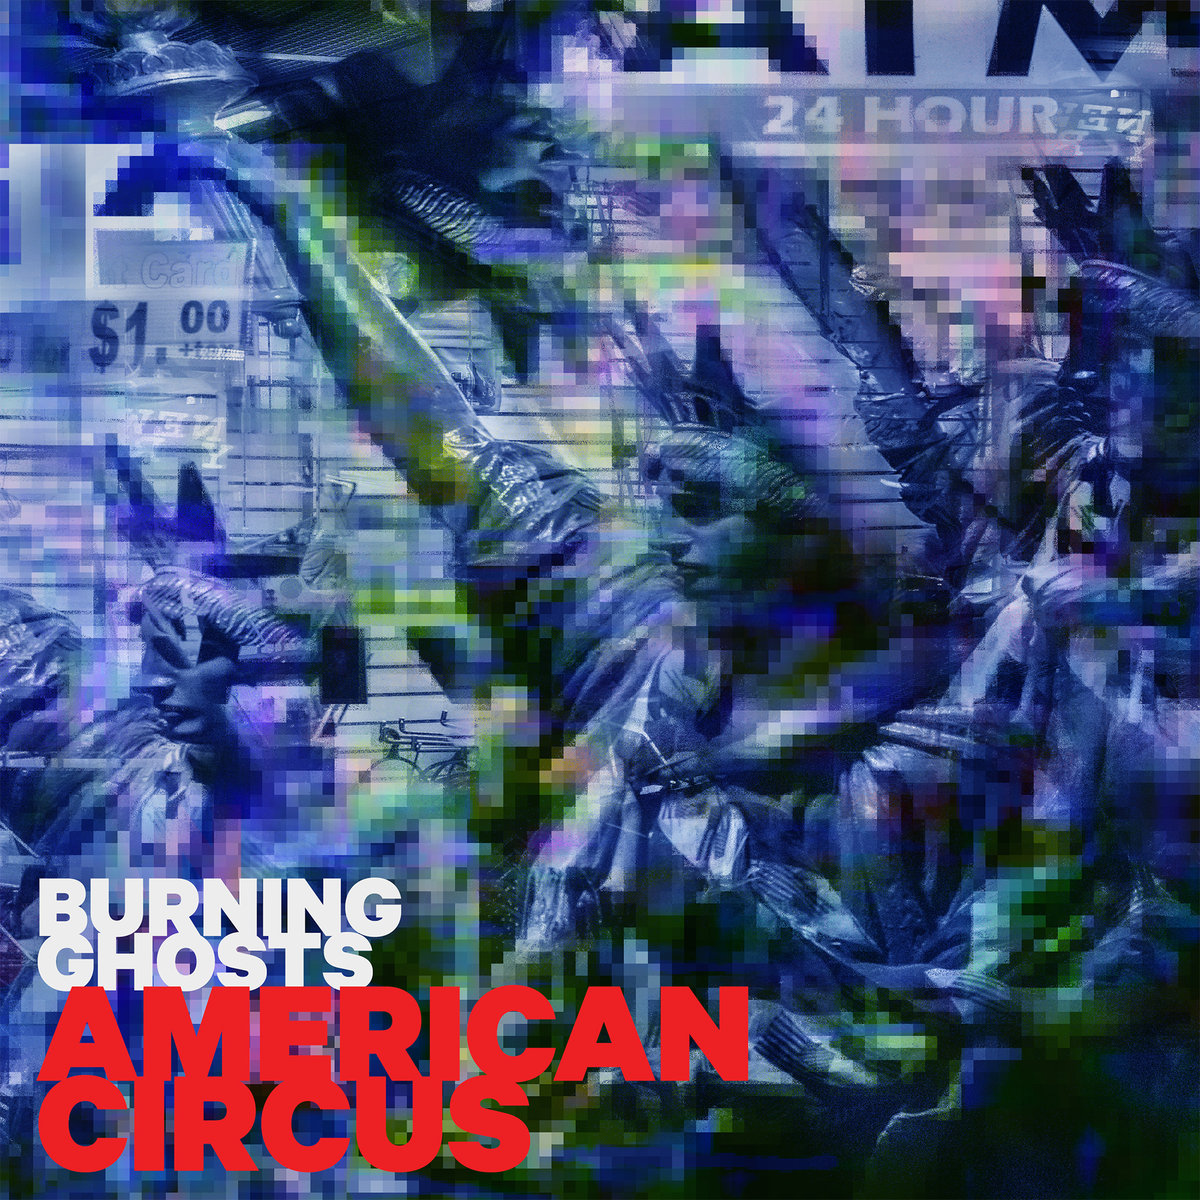 Burning Ghosts // American Circus   (2019)   ORENDA RECORDS (ORENDA0060)